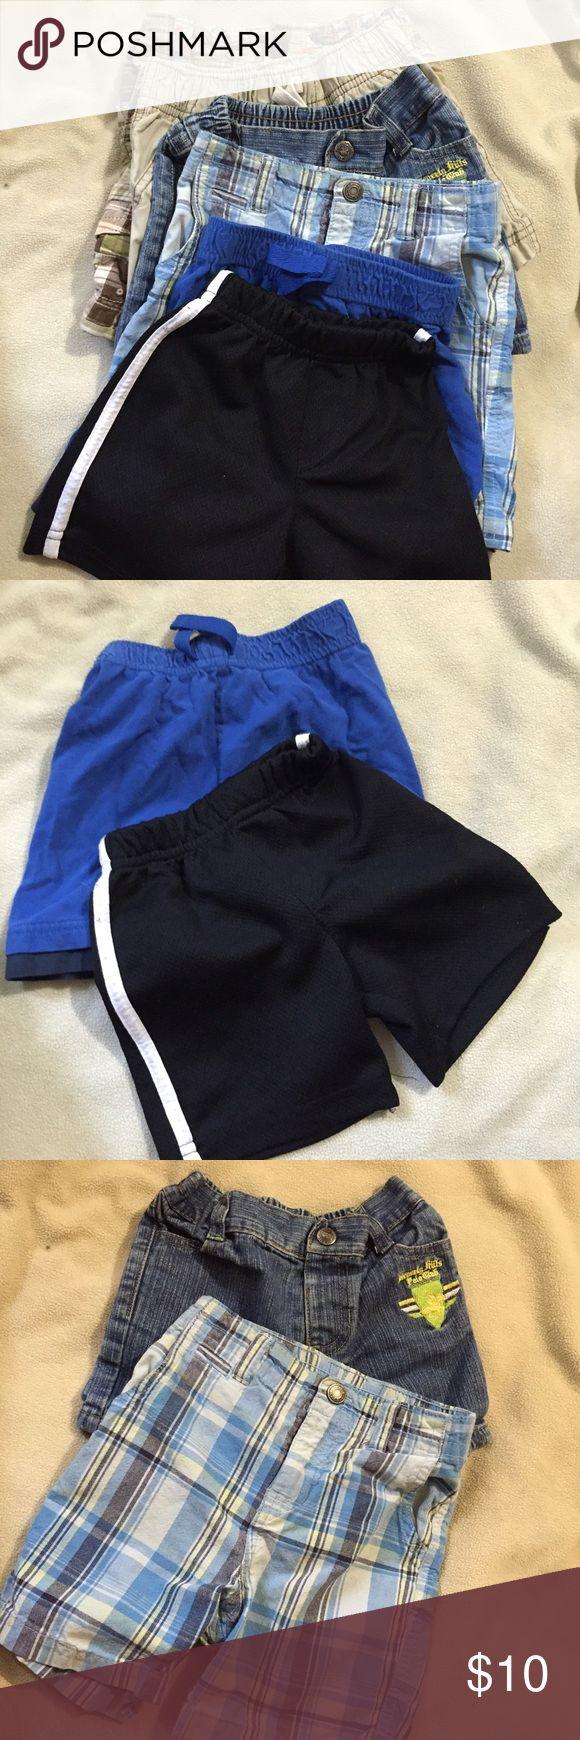 6--2t short bundle Black/white 2t gym shorts, Garanumals blue 24 mo shorts, Carters blue/green 24 mo shorts, Beverly Polo 6-9 mo blue shorts (fits 2t), Carters khaki 2t shorts, and Old Navy khaki with palms 2t shorts Carter's Bottoms Shorts